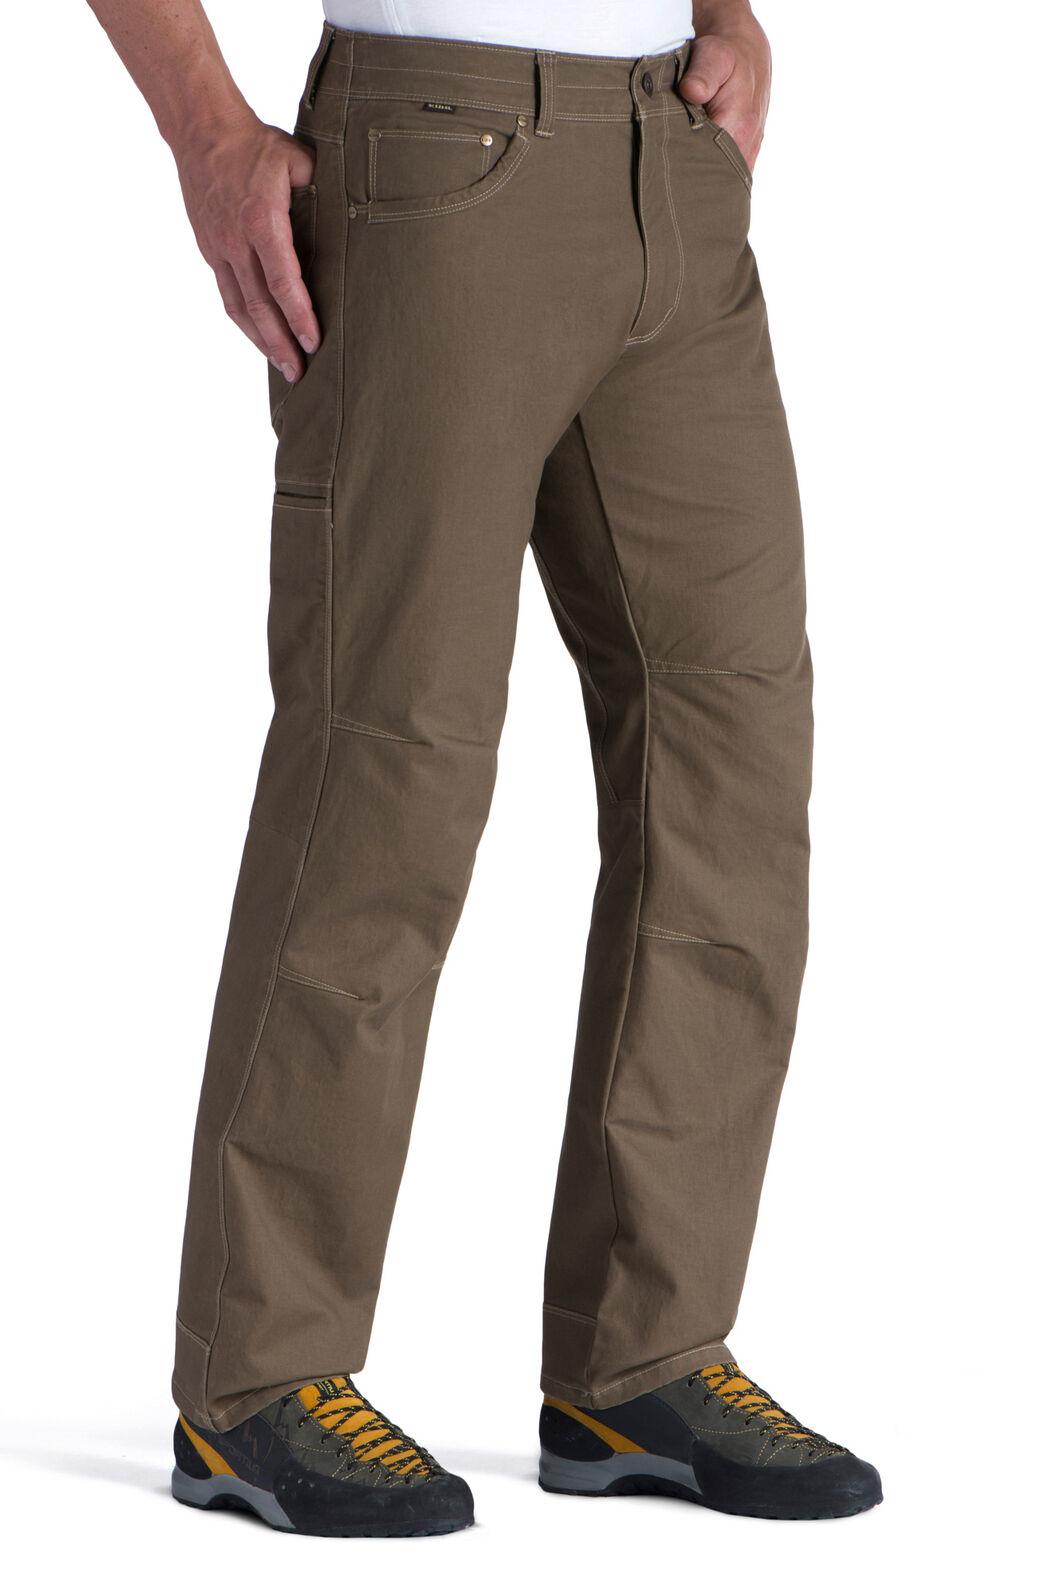 Kuhl Rydr Pants (30 inch leg) - Men's, Khaki, hi-res